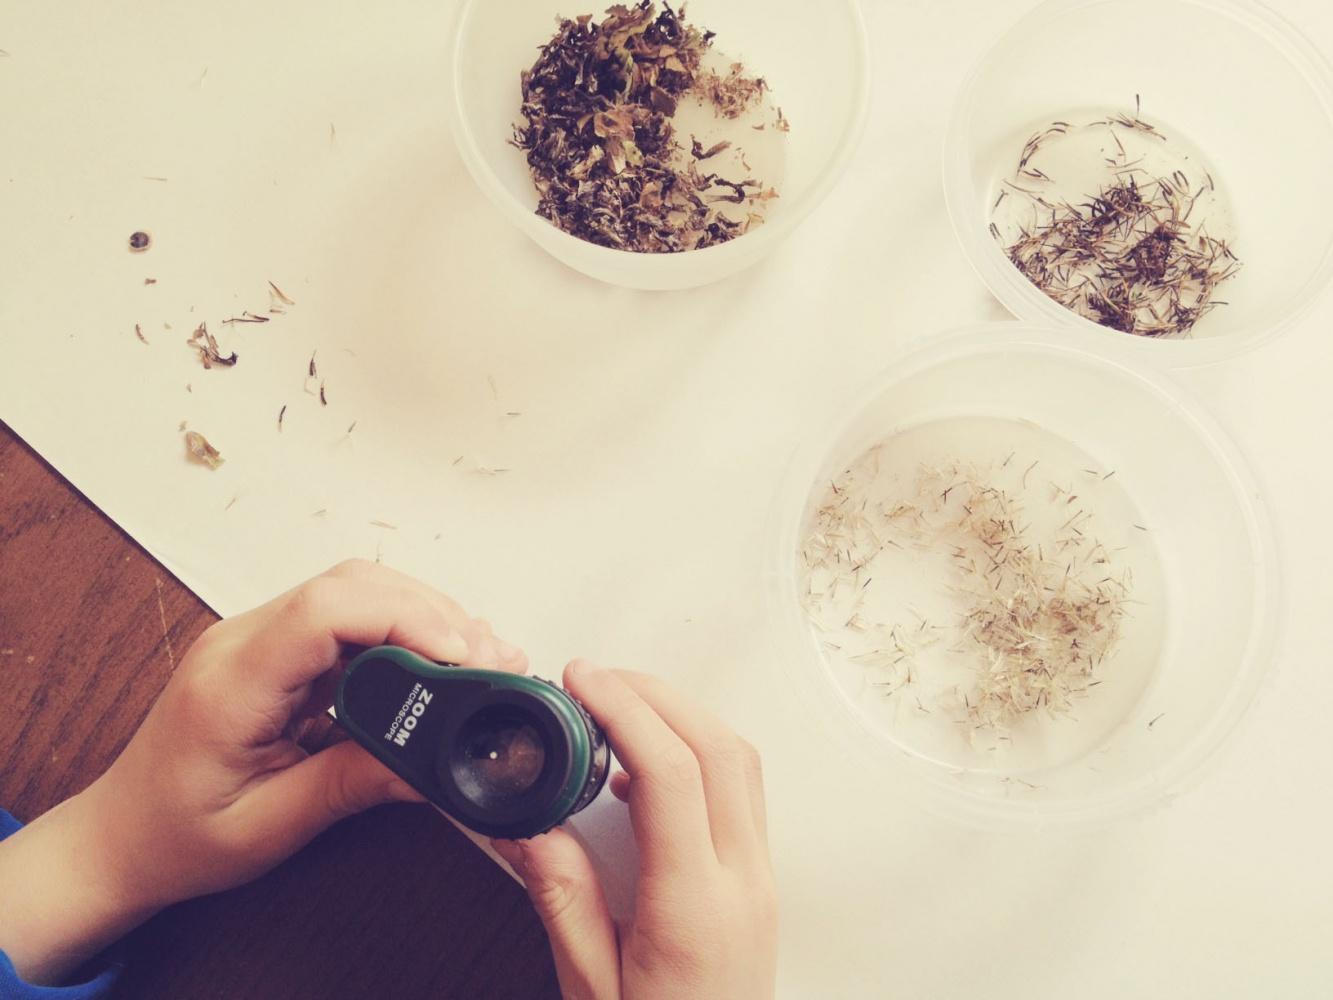 Tiny Peasant Microscope Seeds